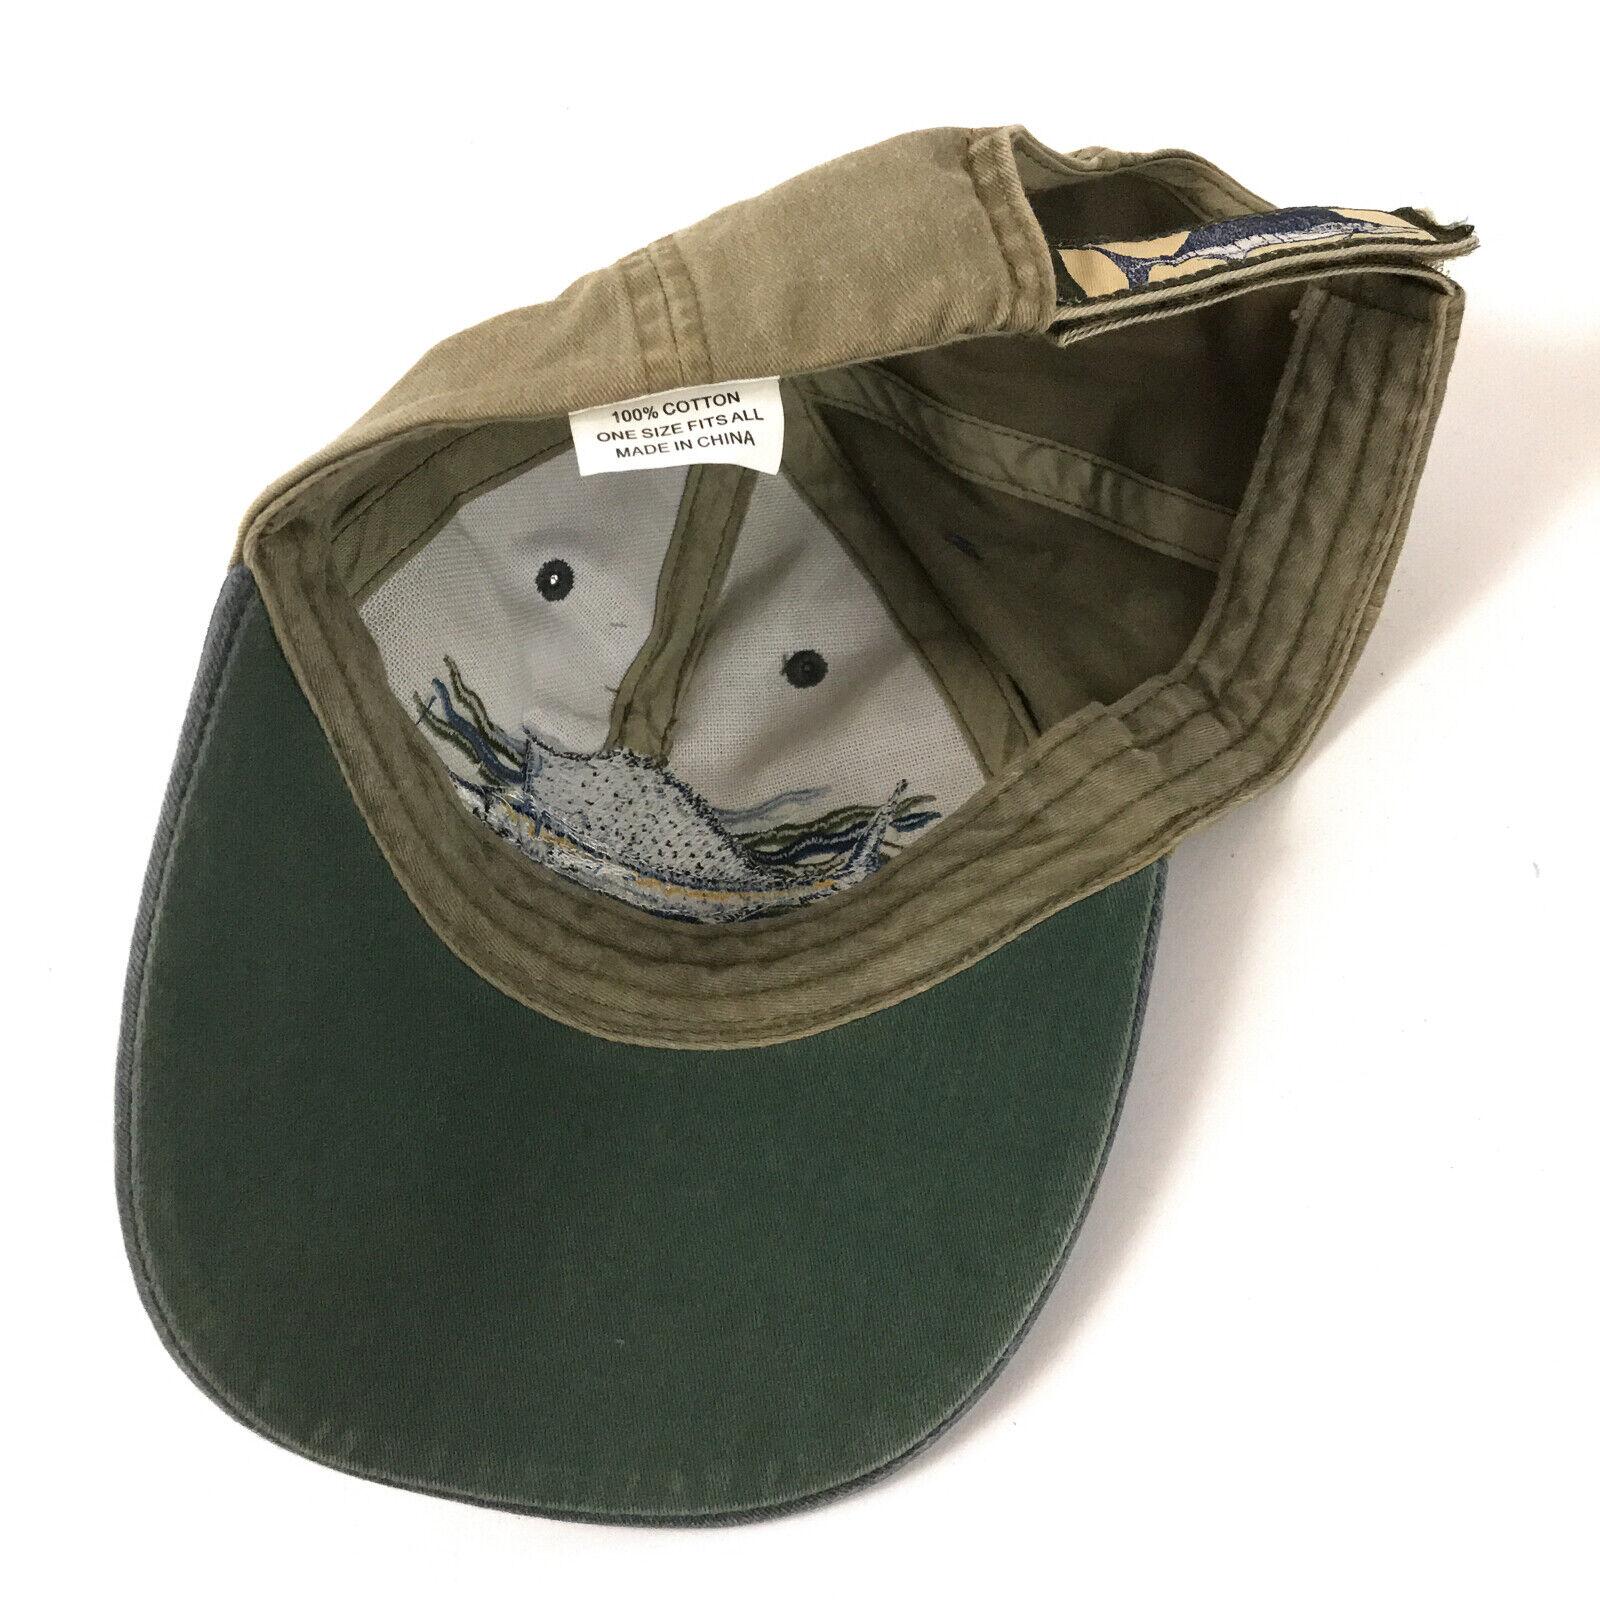 SAILFISH Baseball Cap BEIGE Sail Fish Fishing Hat Adjustable Embroidered AE8